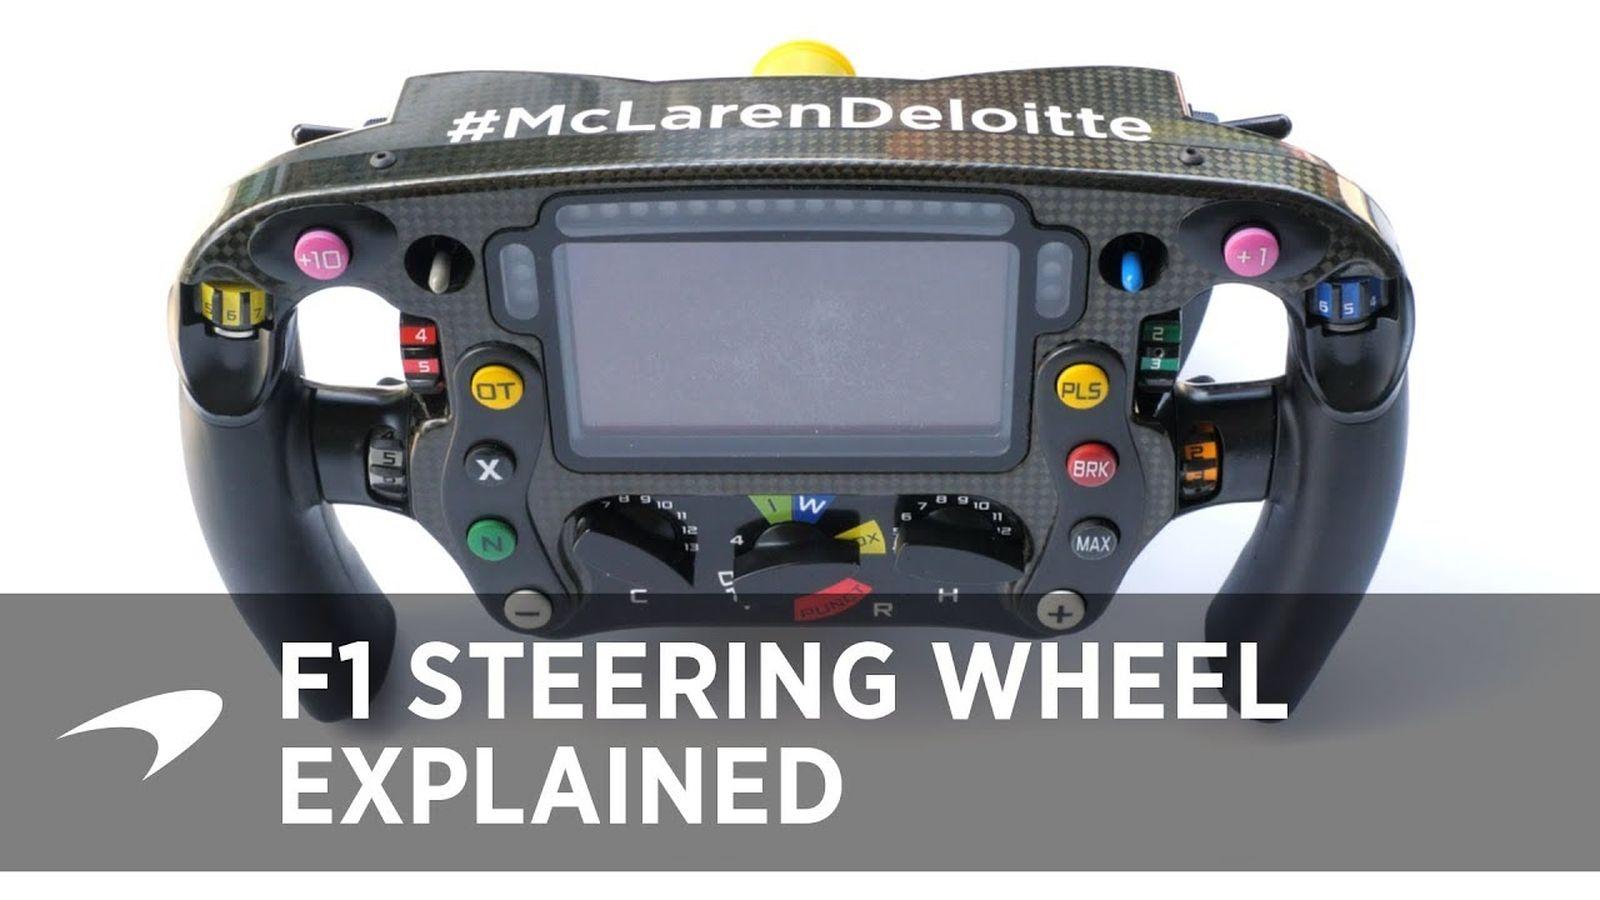 Mclaren Kit Car >> McLaren Formula 1 - A guide to the F1 steering wheel